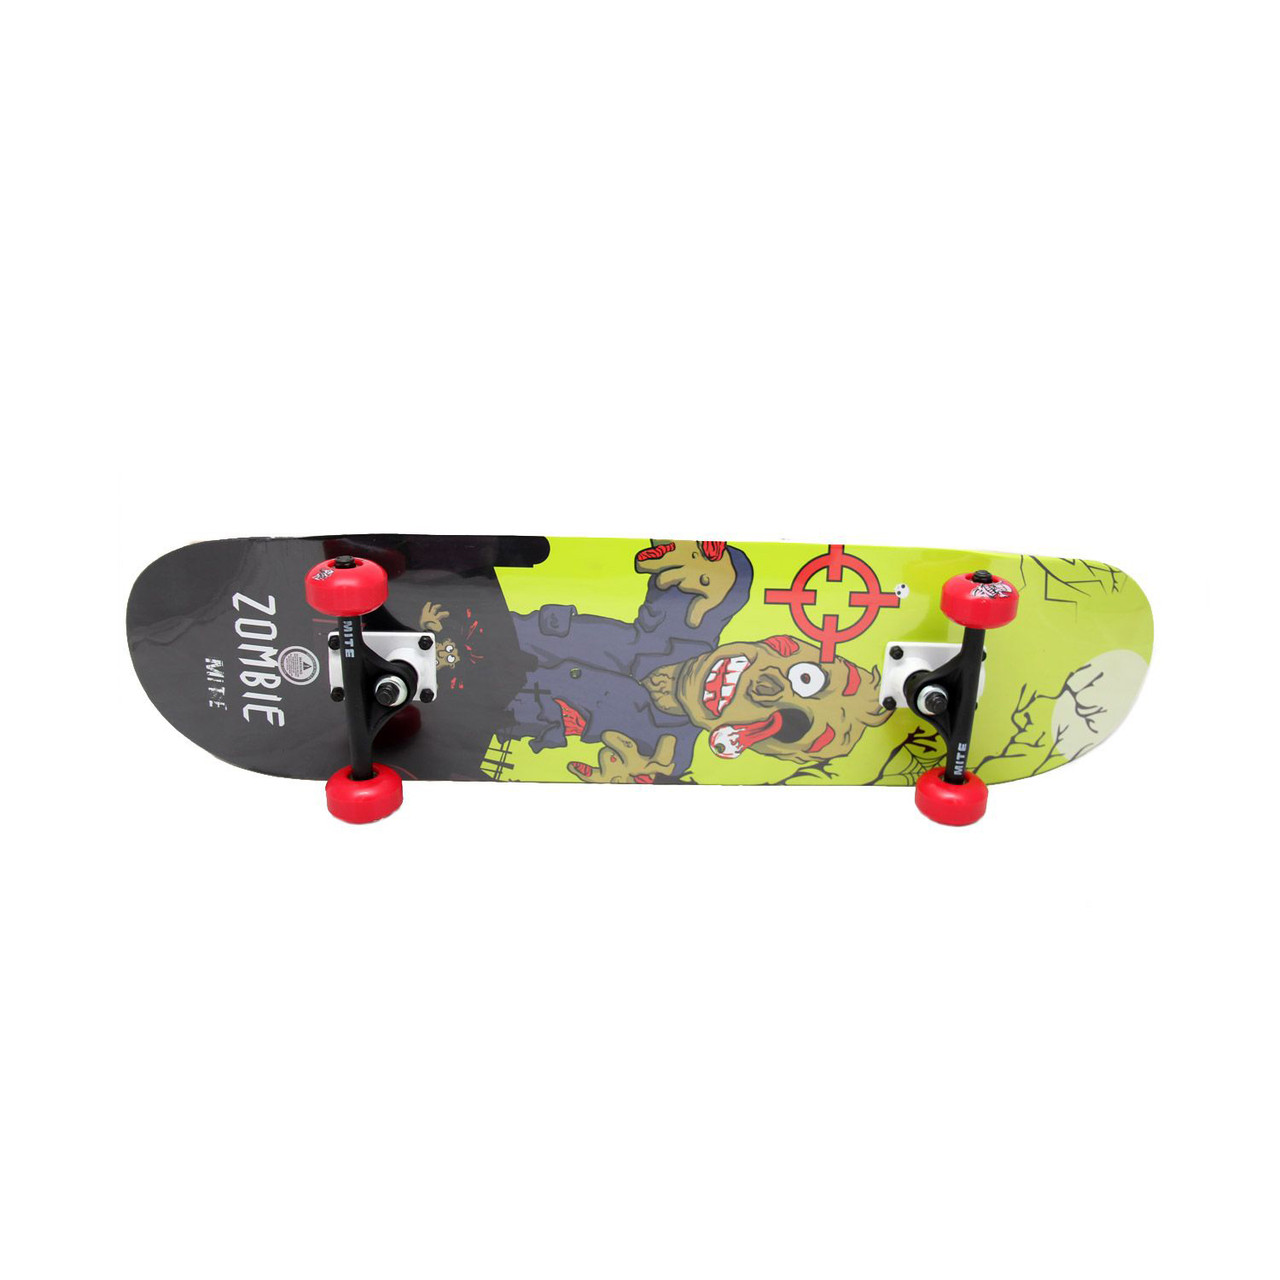 Купить Скейт скейтборд Skateboard Python Zombie клен в Киеве от ... b591d4bd835